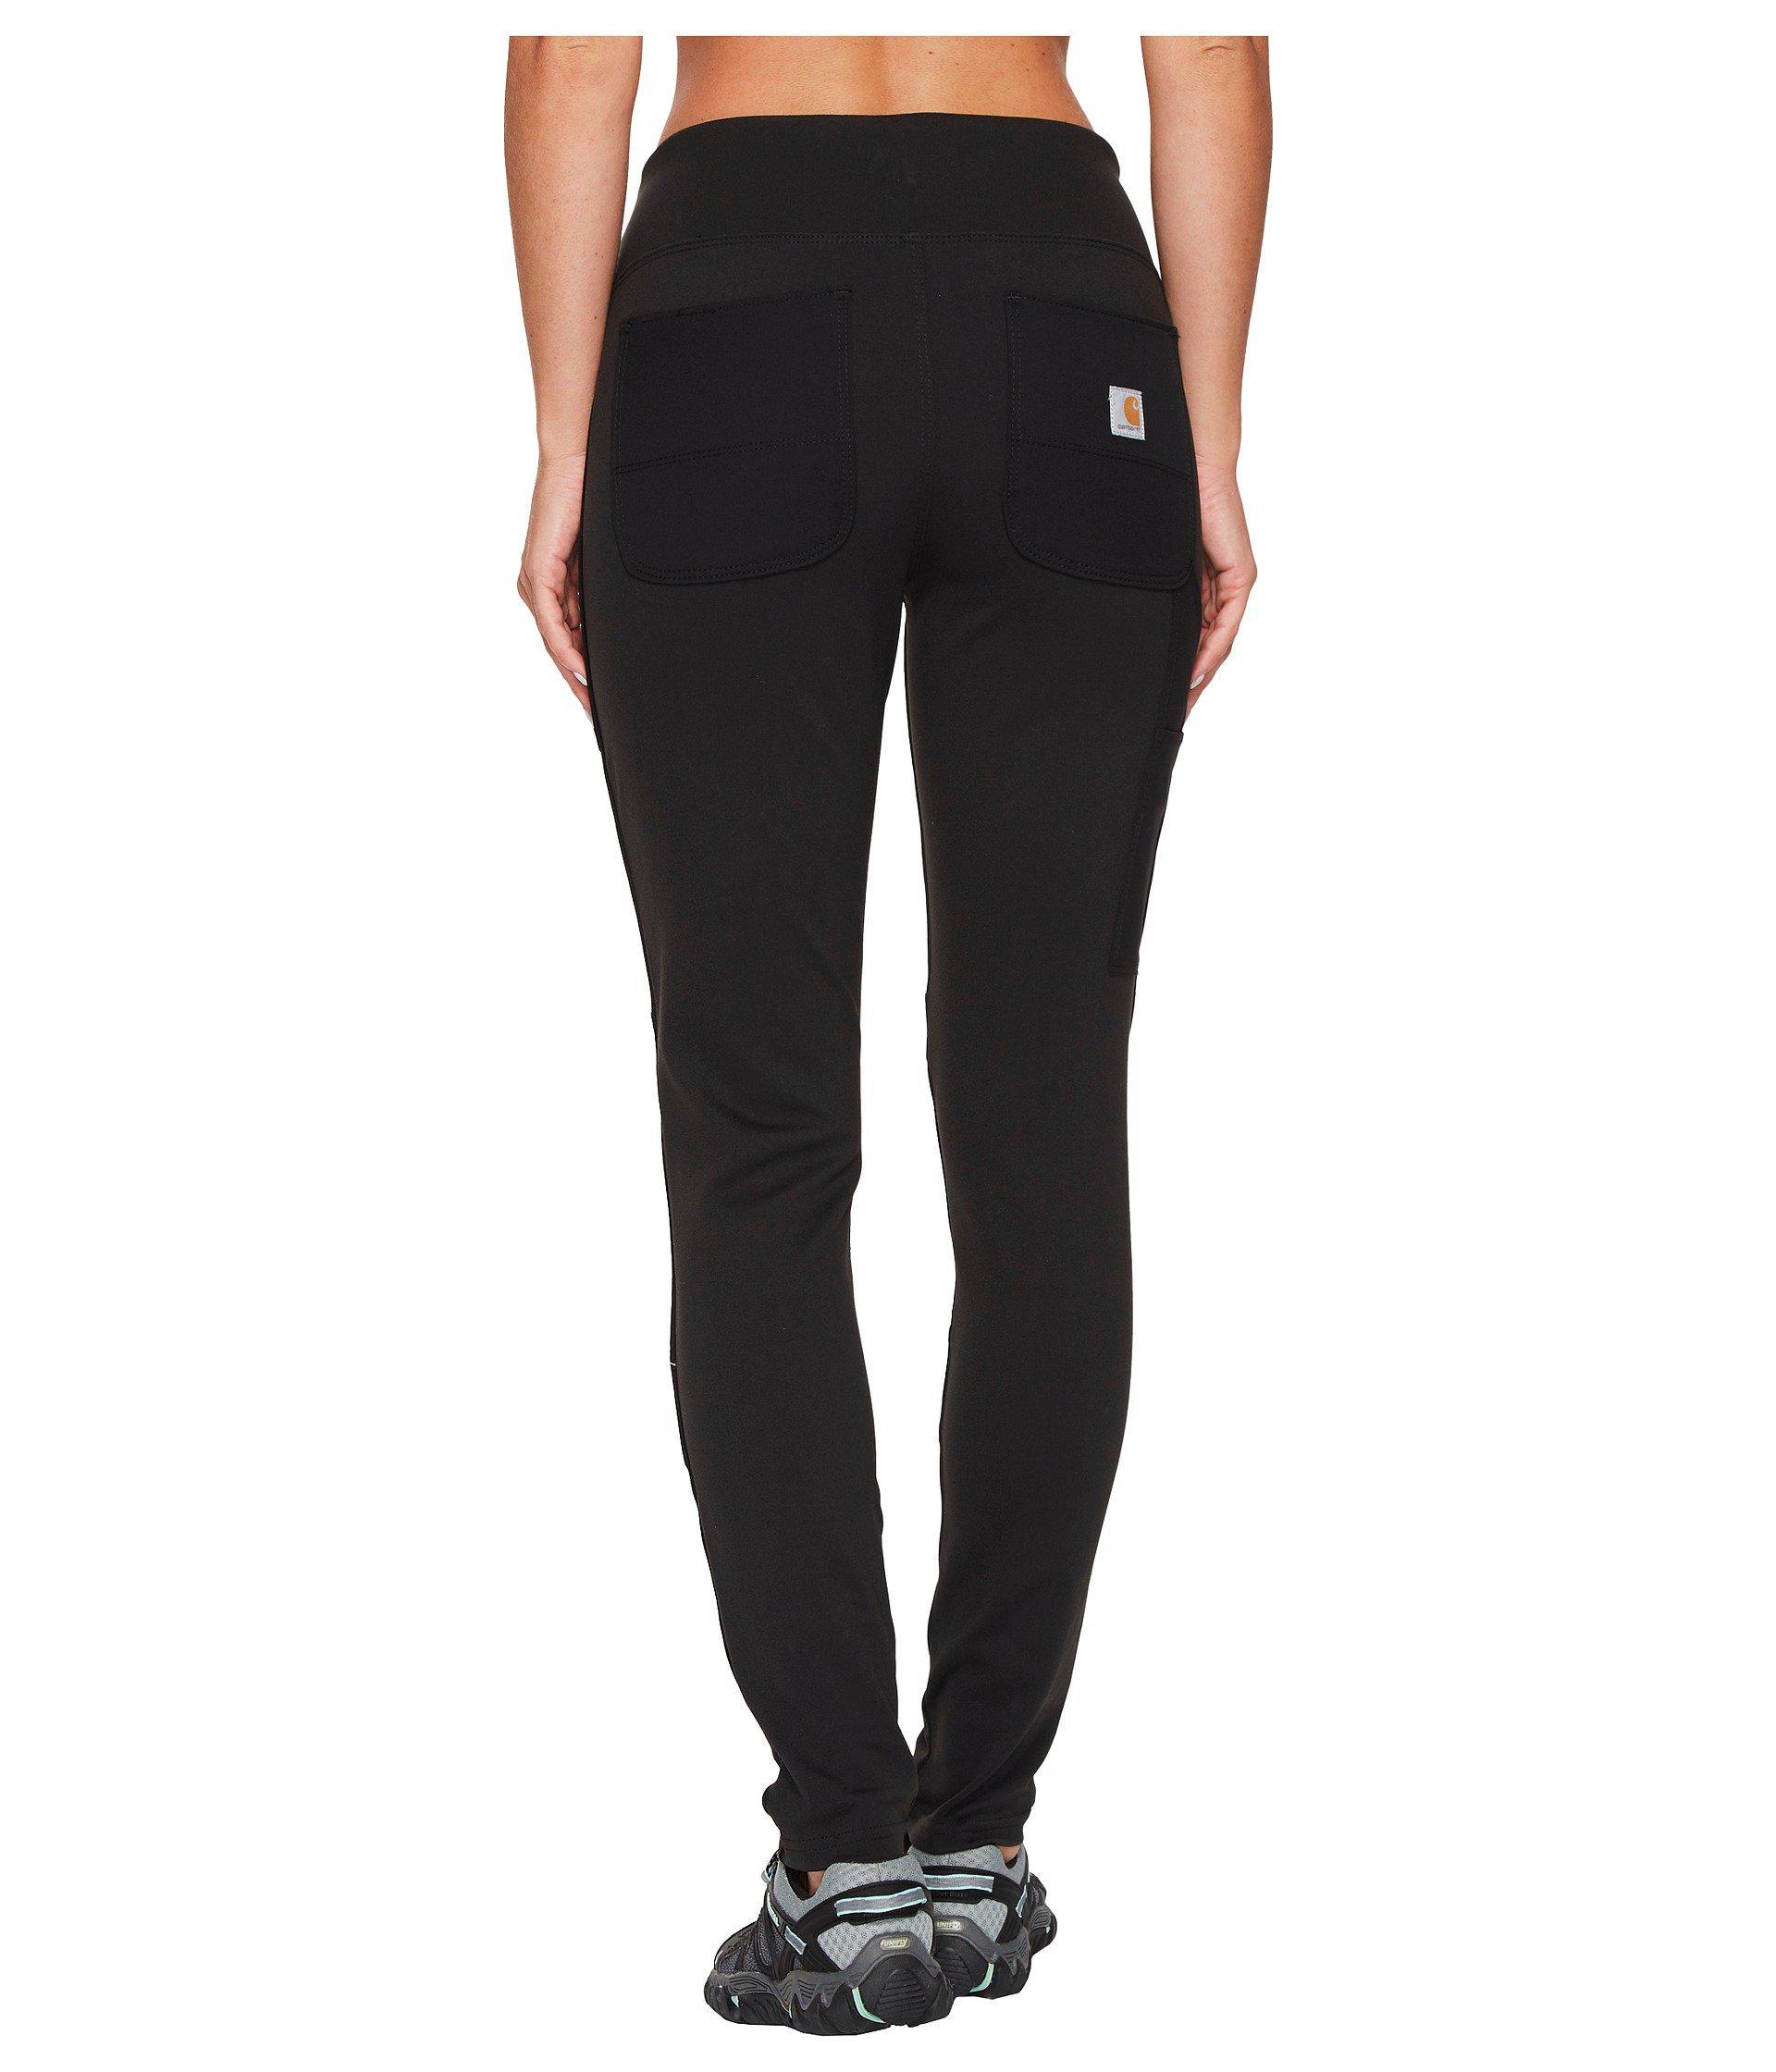 9c3bcbfc8e Women's Black Force Utility Knit Pants